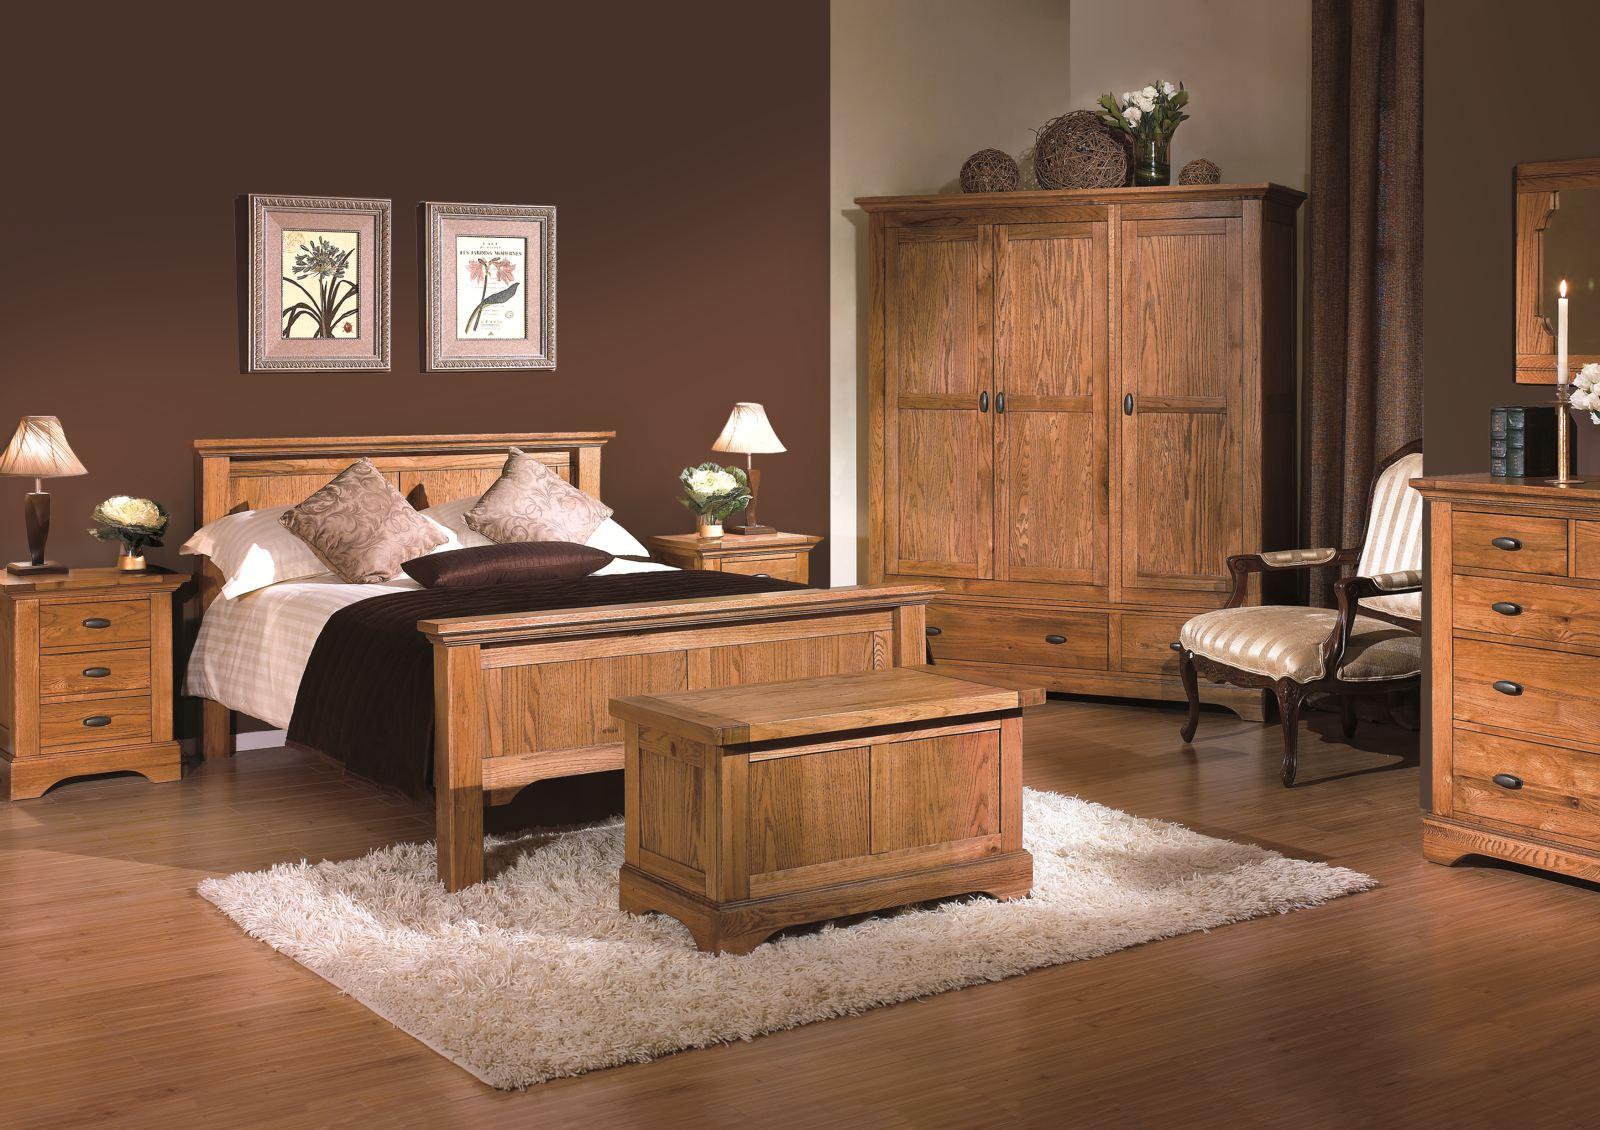 bedroom ideas oak furniture photo - 9